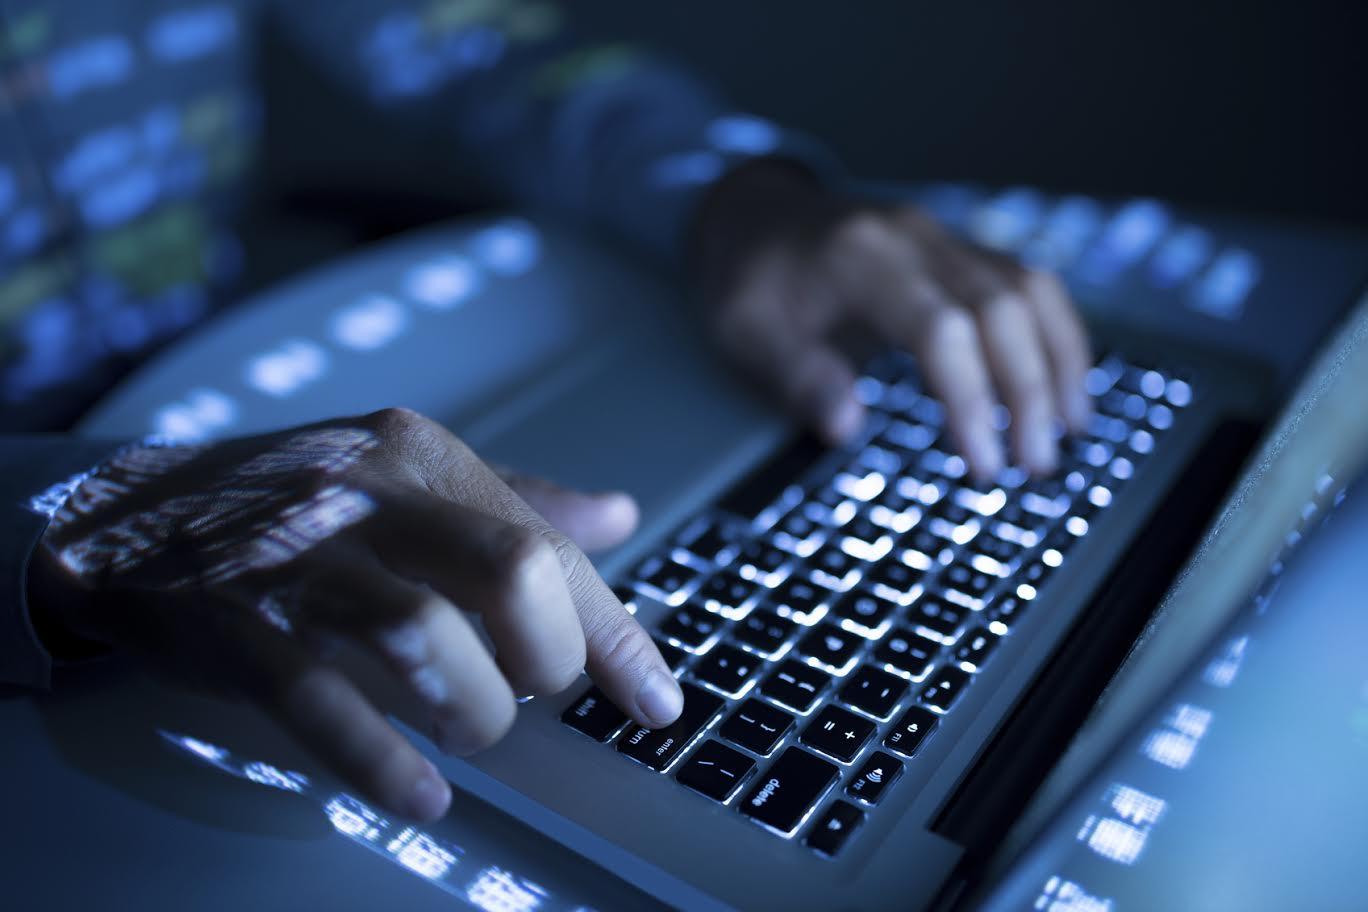 europe extortion webcam bribery